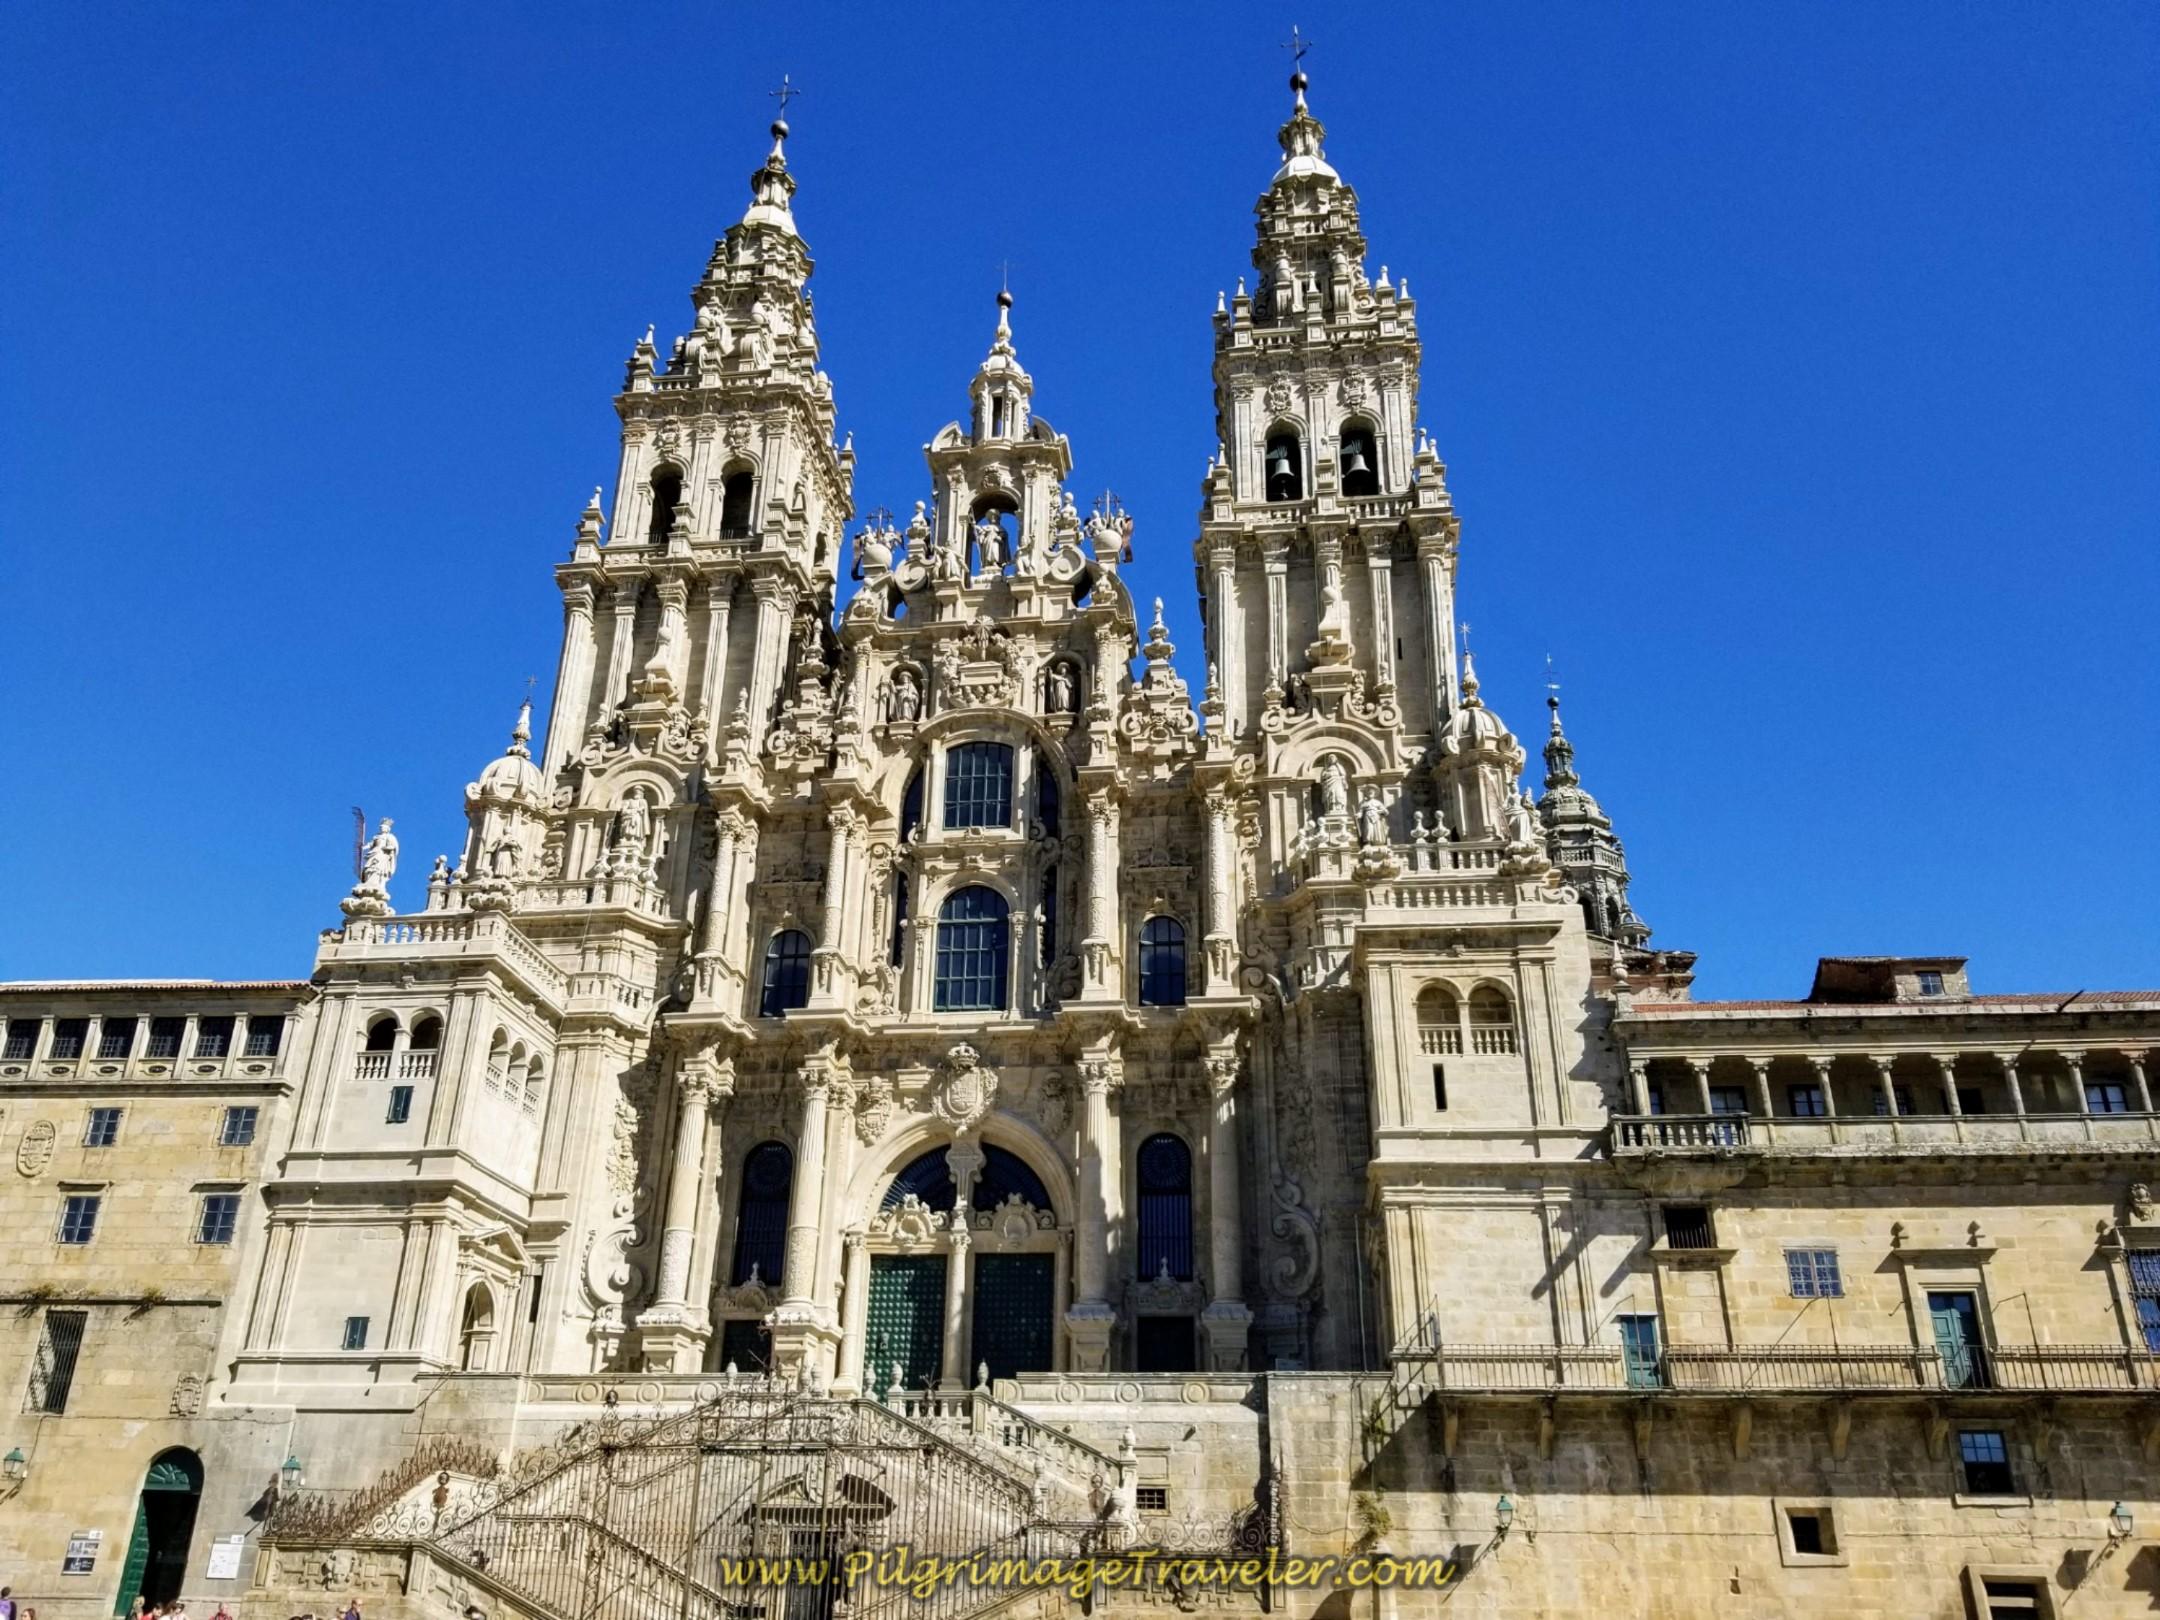 Cathedral of Santiago de Compostela, Restoration complete